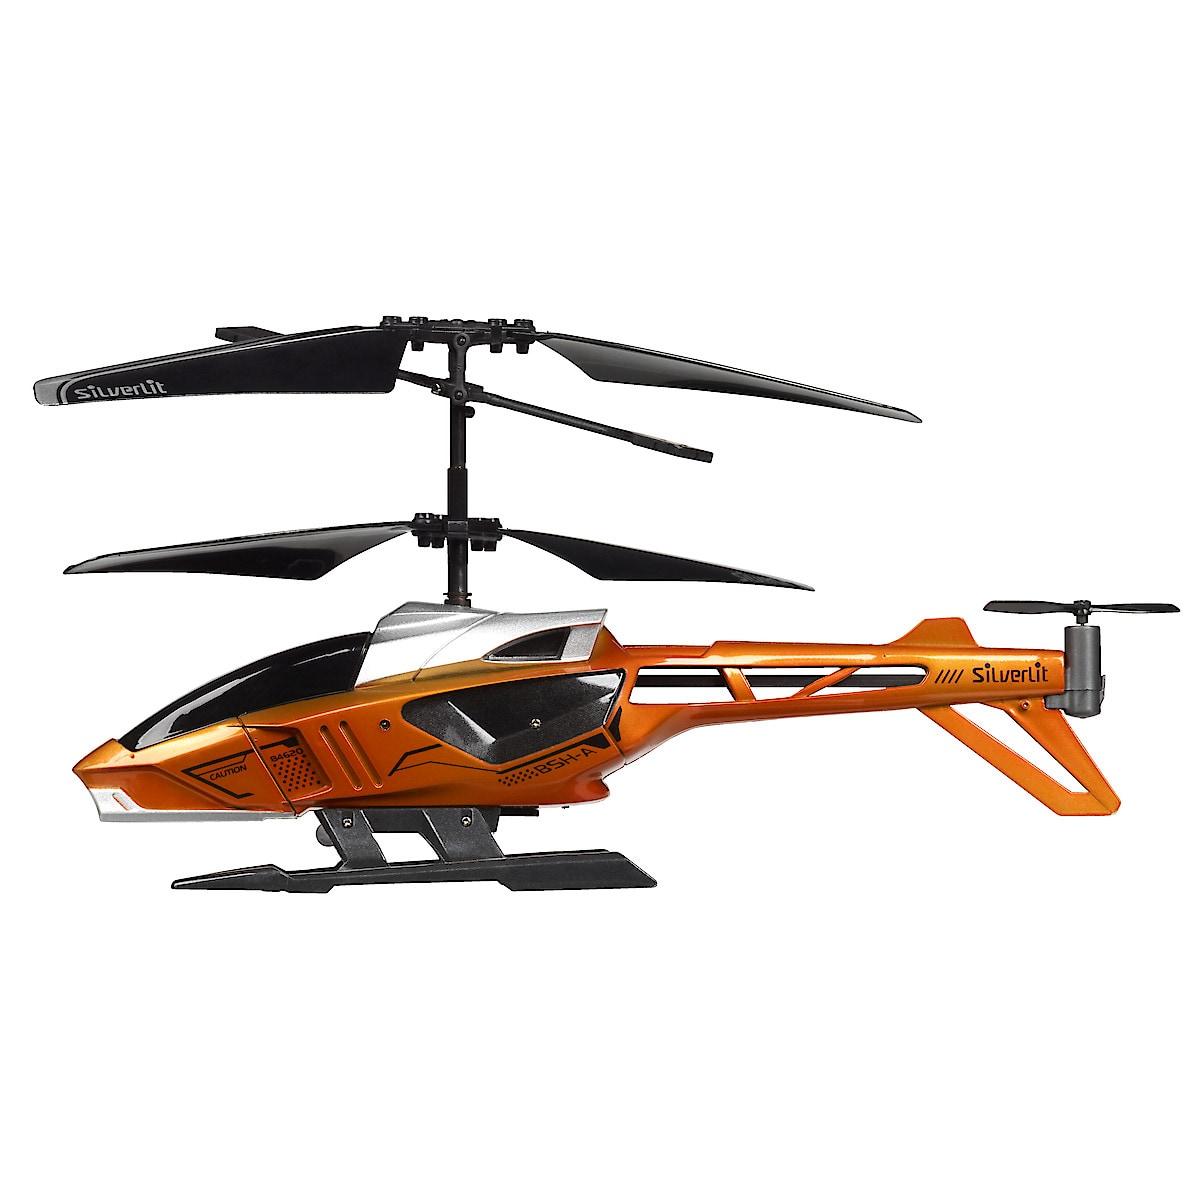 Silverlit Apple Bluetooth R/C helikopter